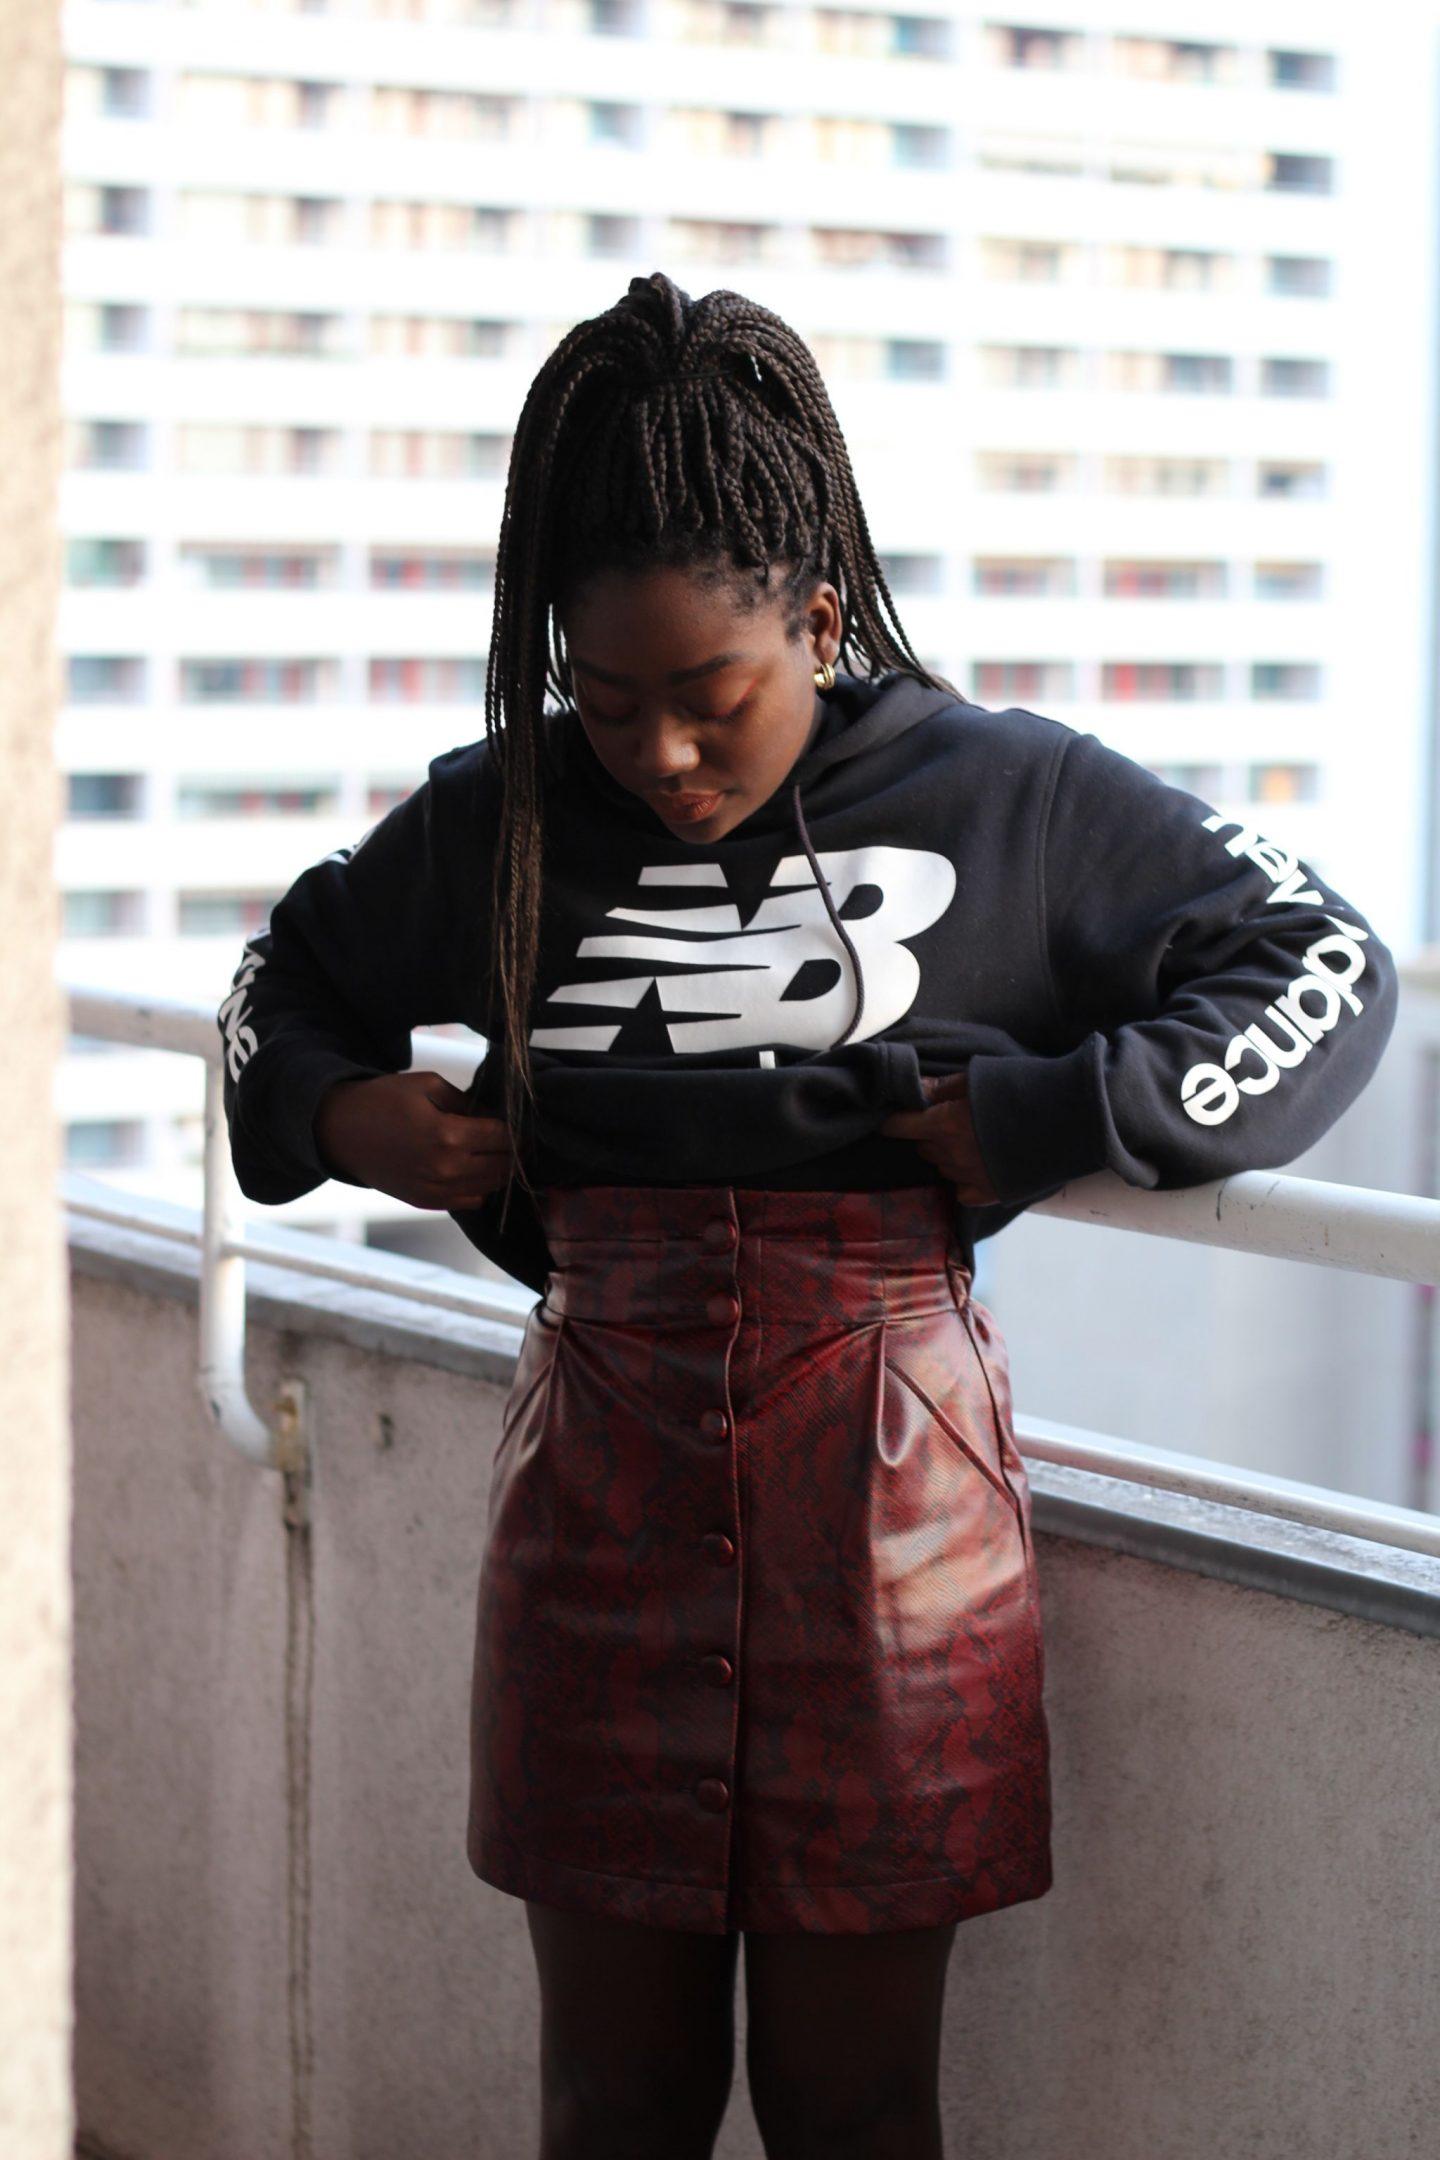 streetwear_chic_newbalance_lois_opoku_fashion_blog_style_berlin_lisforlois_2